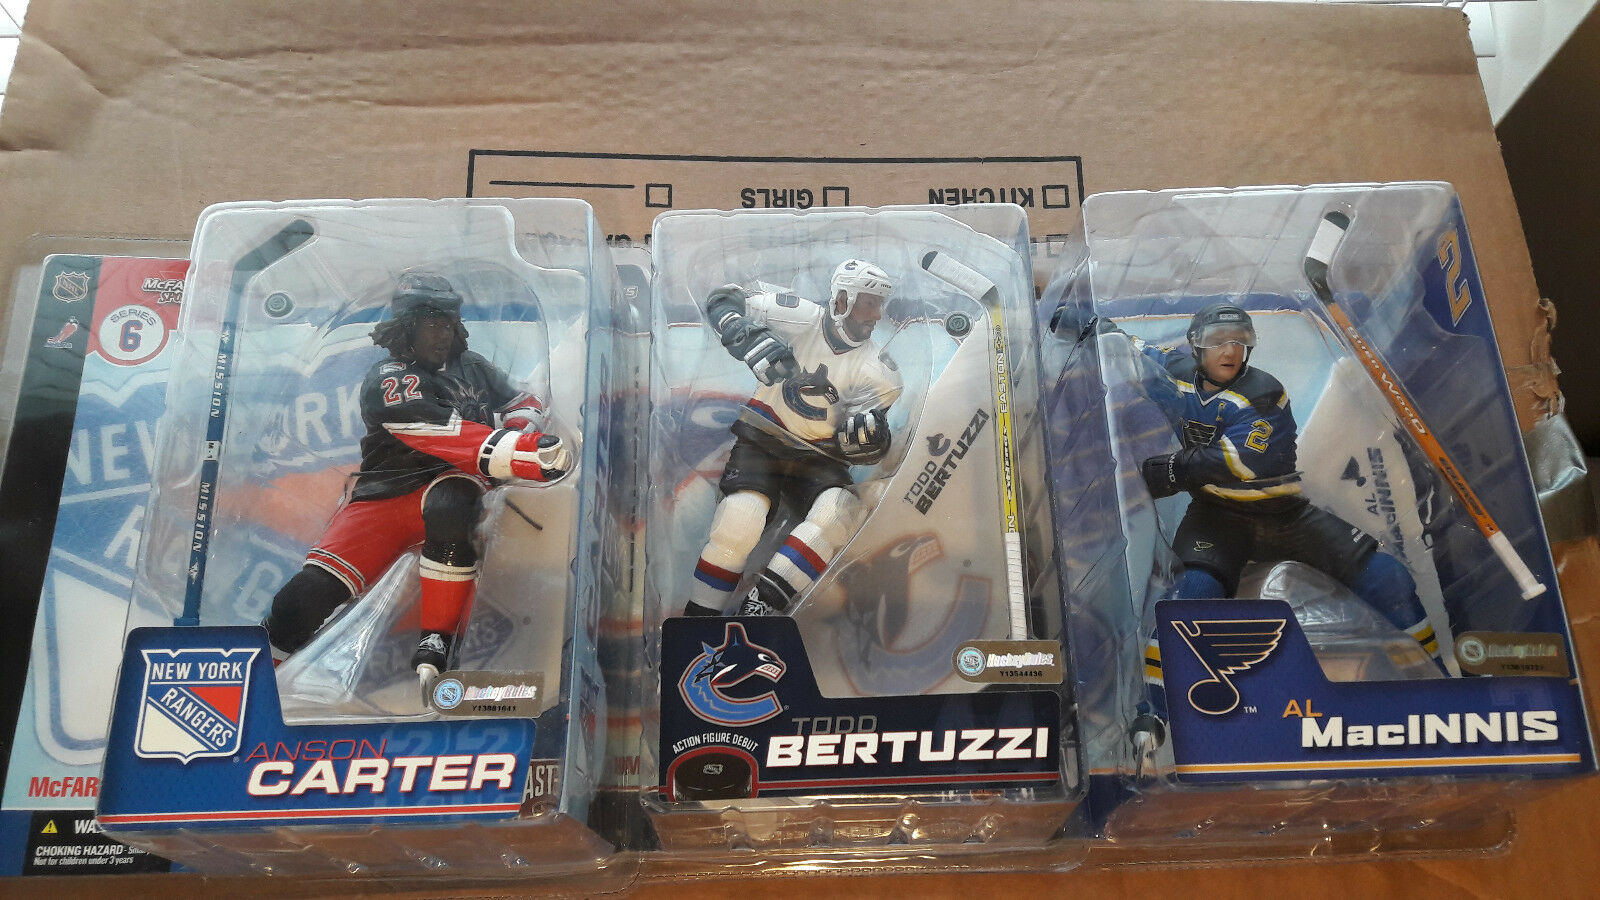 Lot 3 McFarlane NHL Series 6 & 7 Bertuzzi Carter MacInnis Rangers Figures NIB